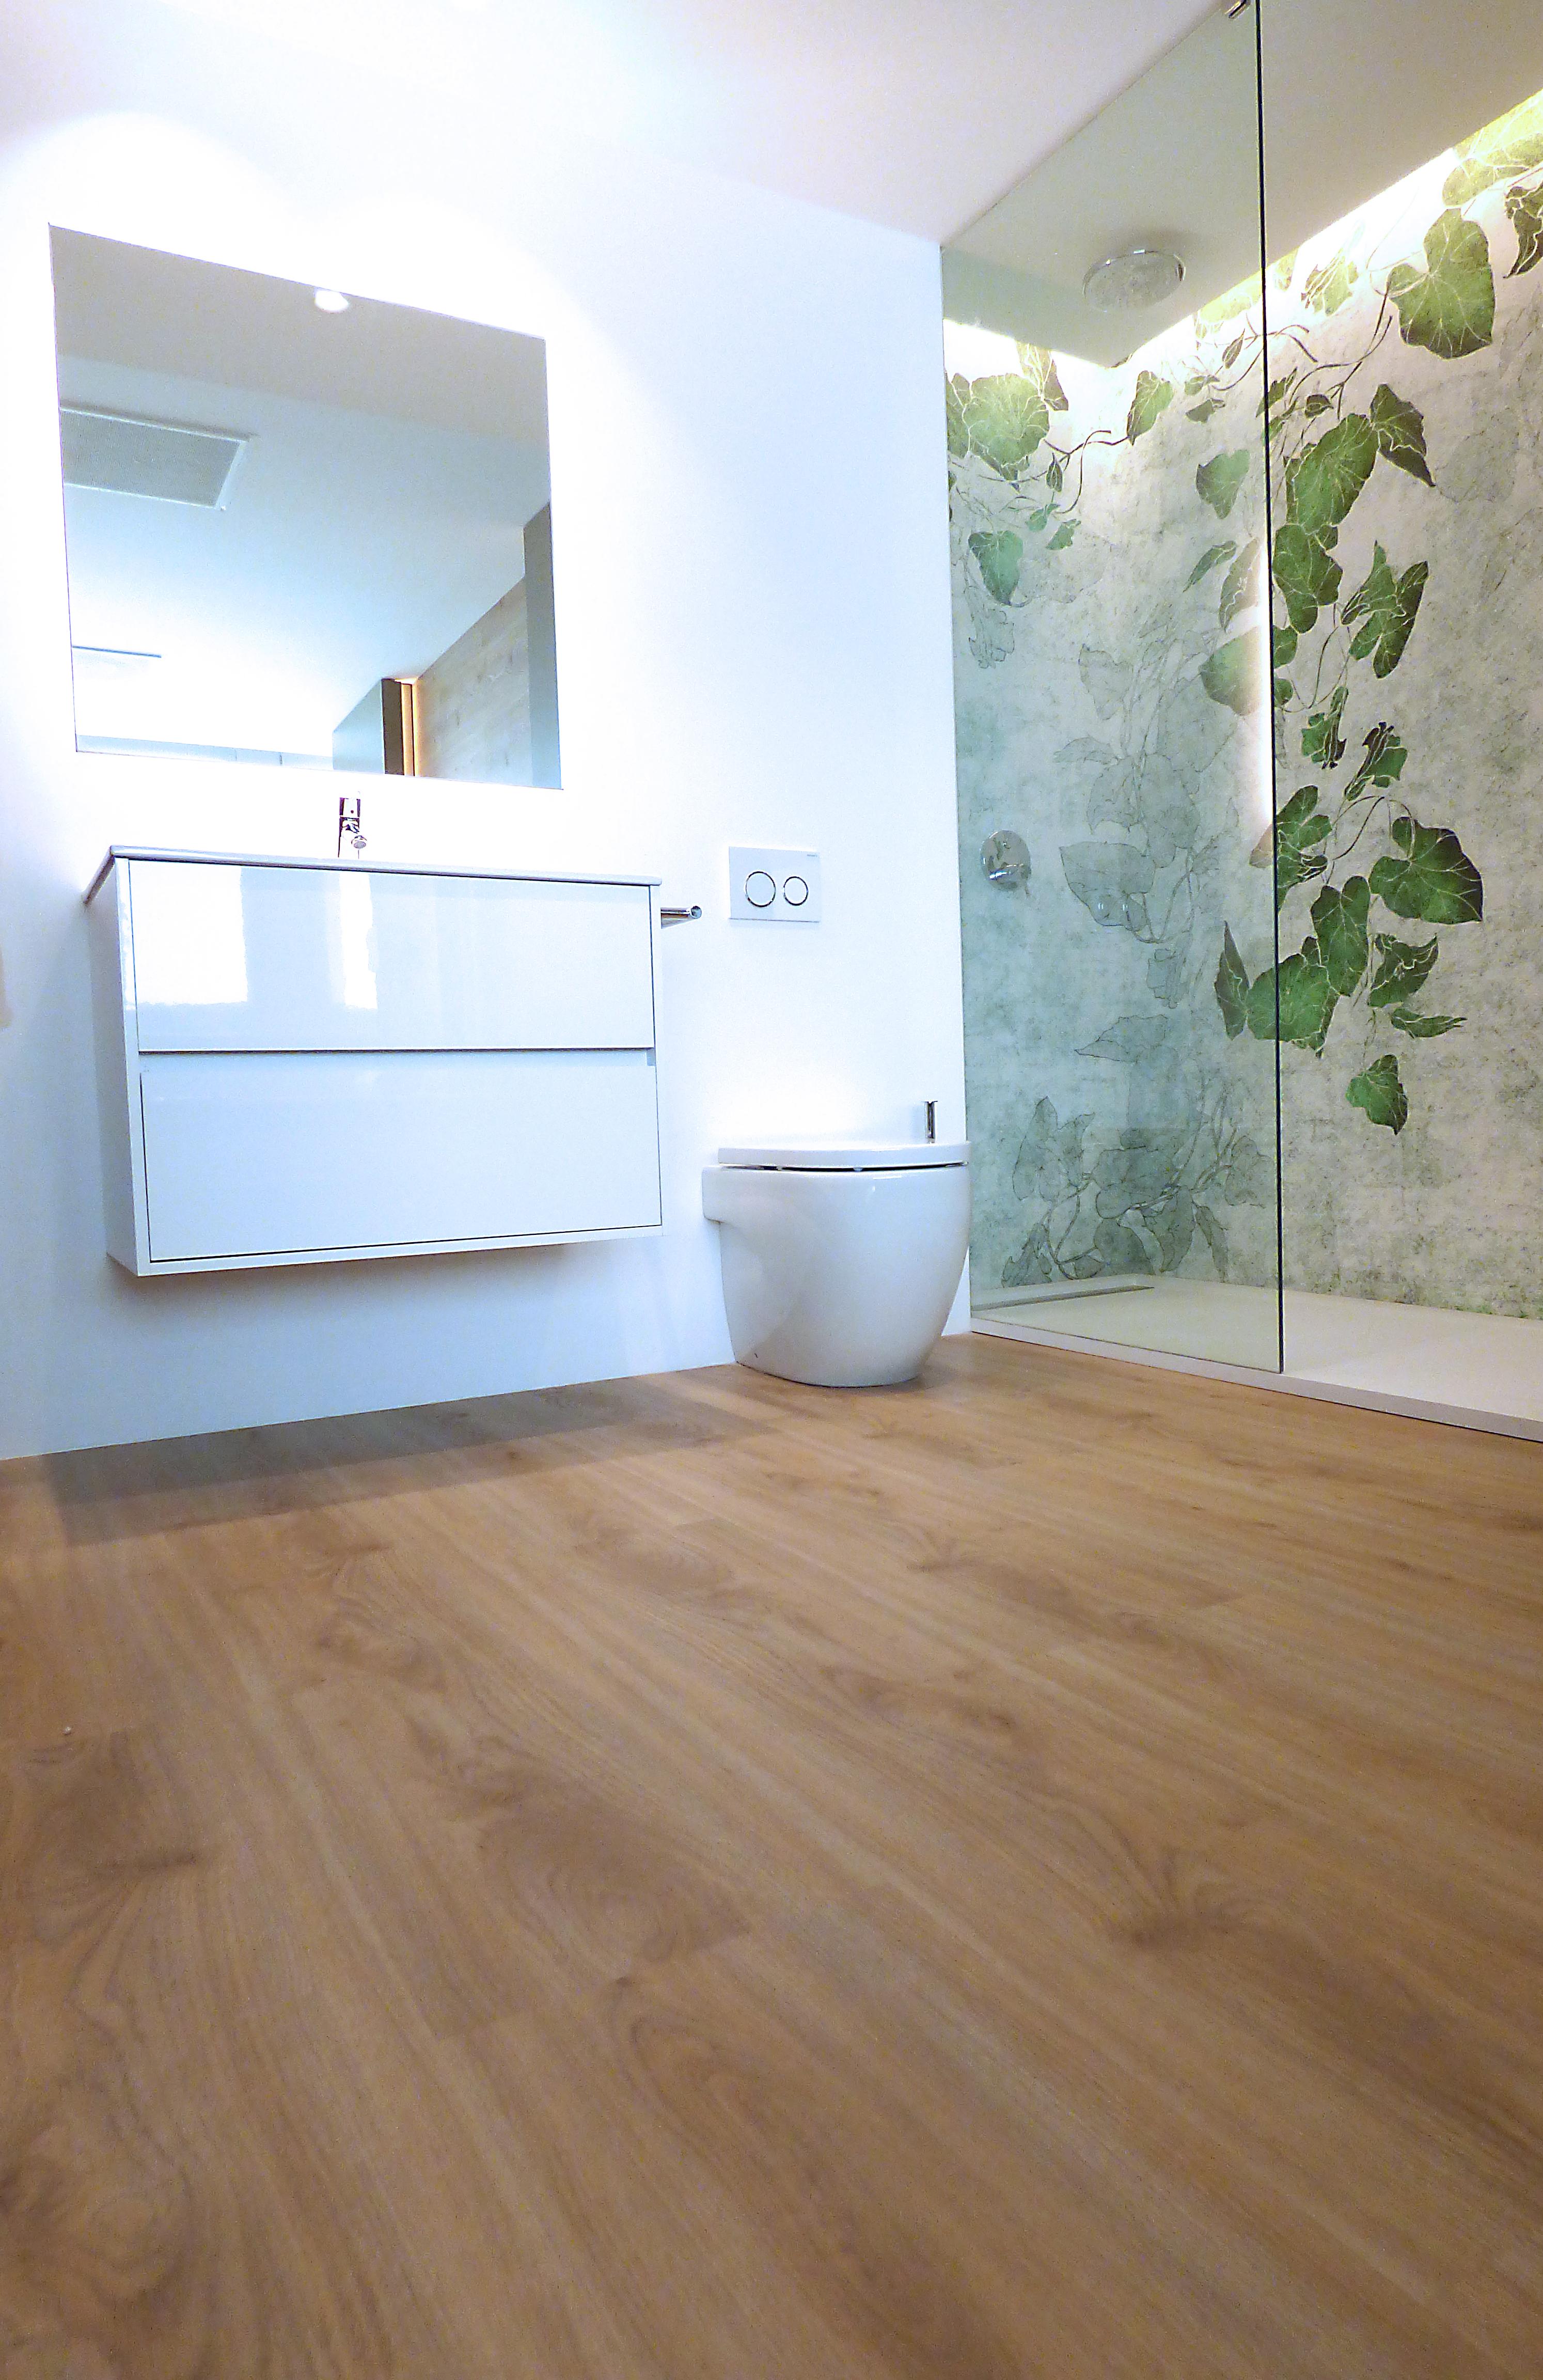 Floover-pavimentos-revestimientos-barcelona-notjustflooring-interiorismo (4)